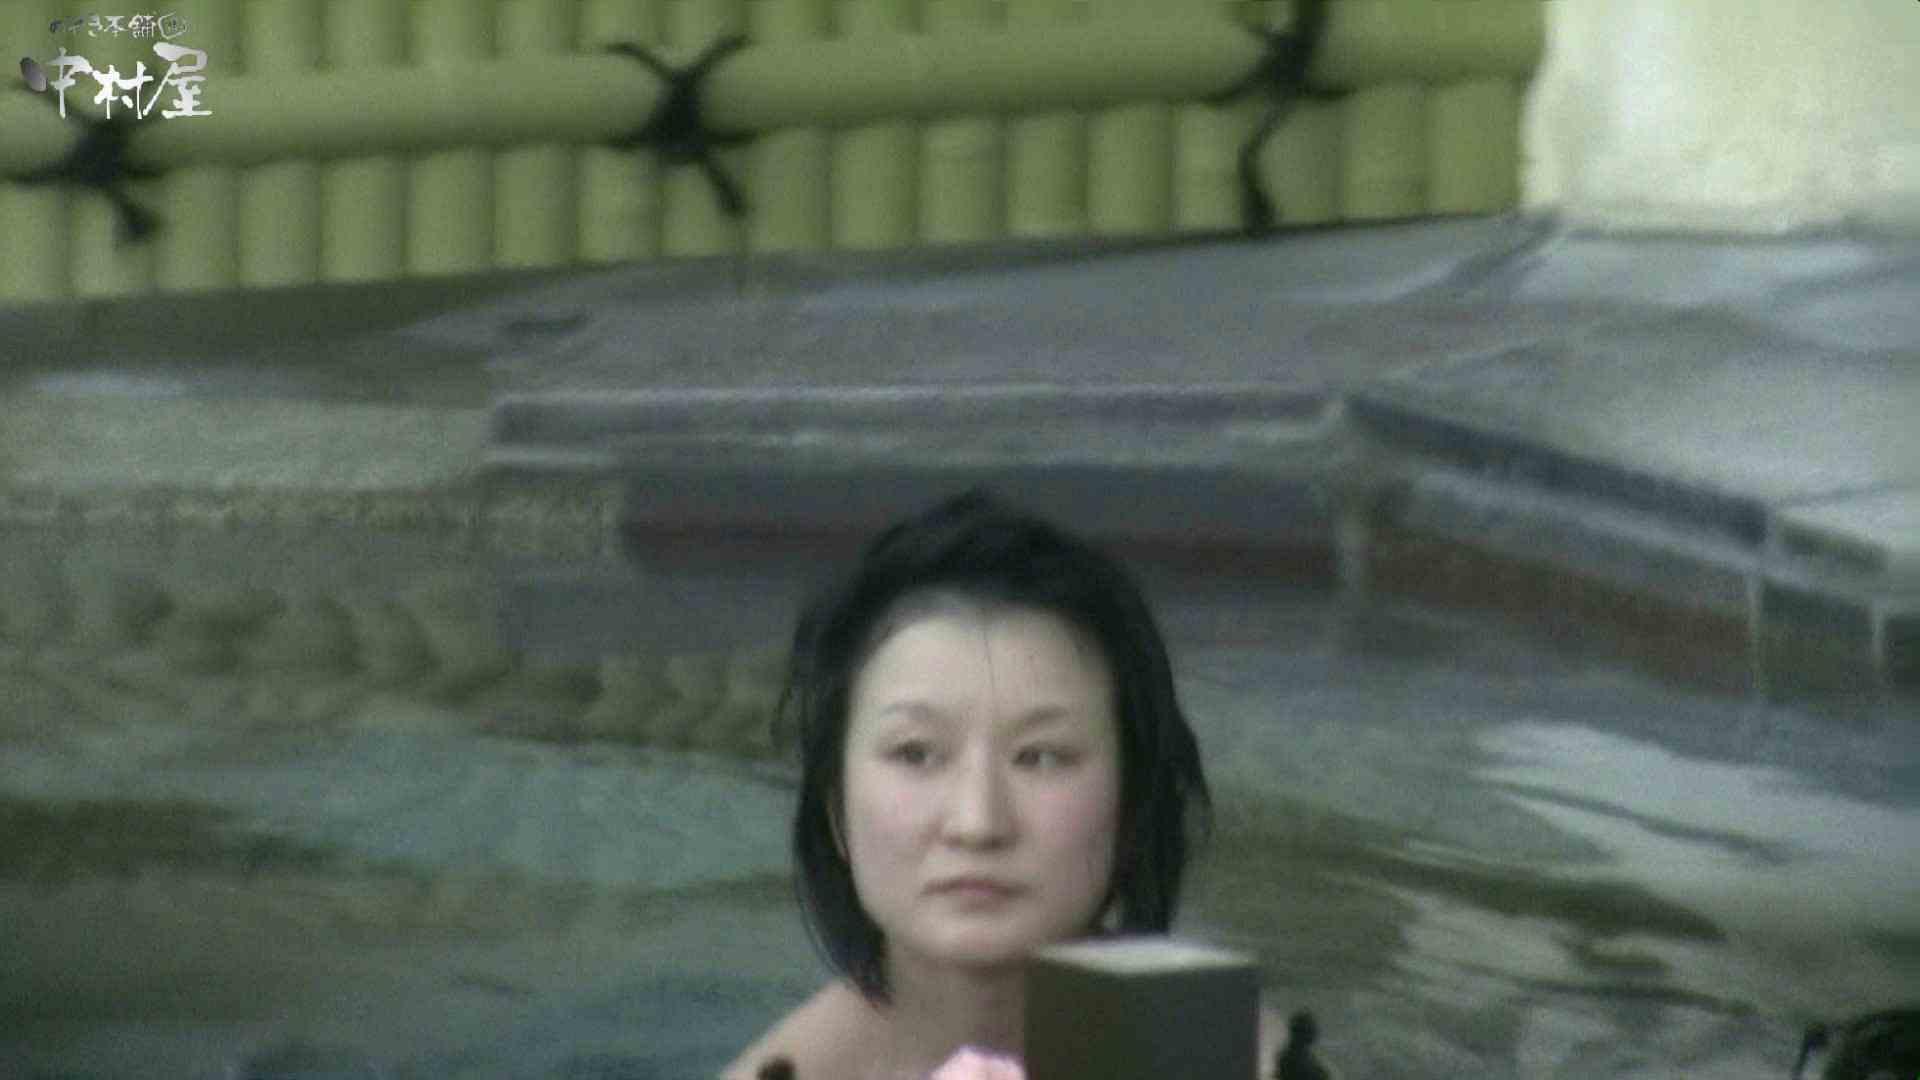 Aquaな露天風呂Vol.982 盗撮特撮 | OLのプライベート  13pic 4